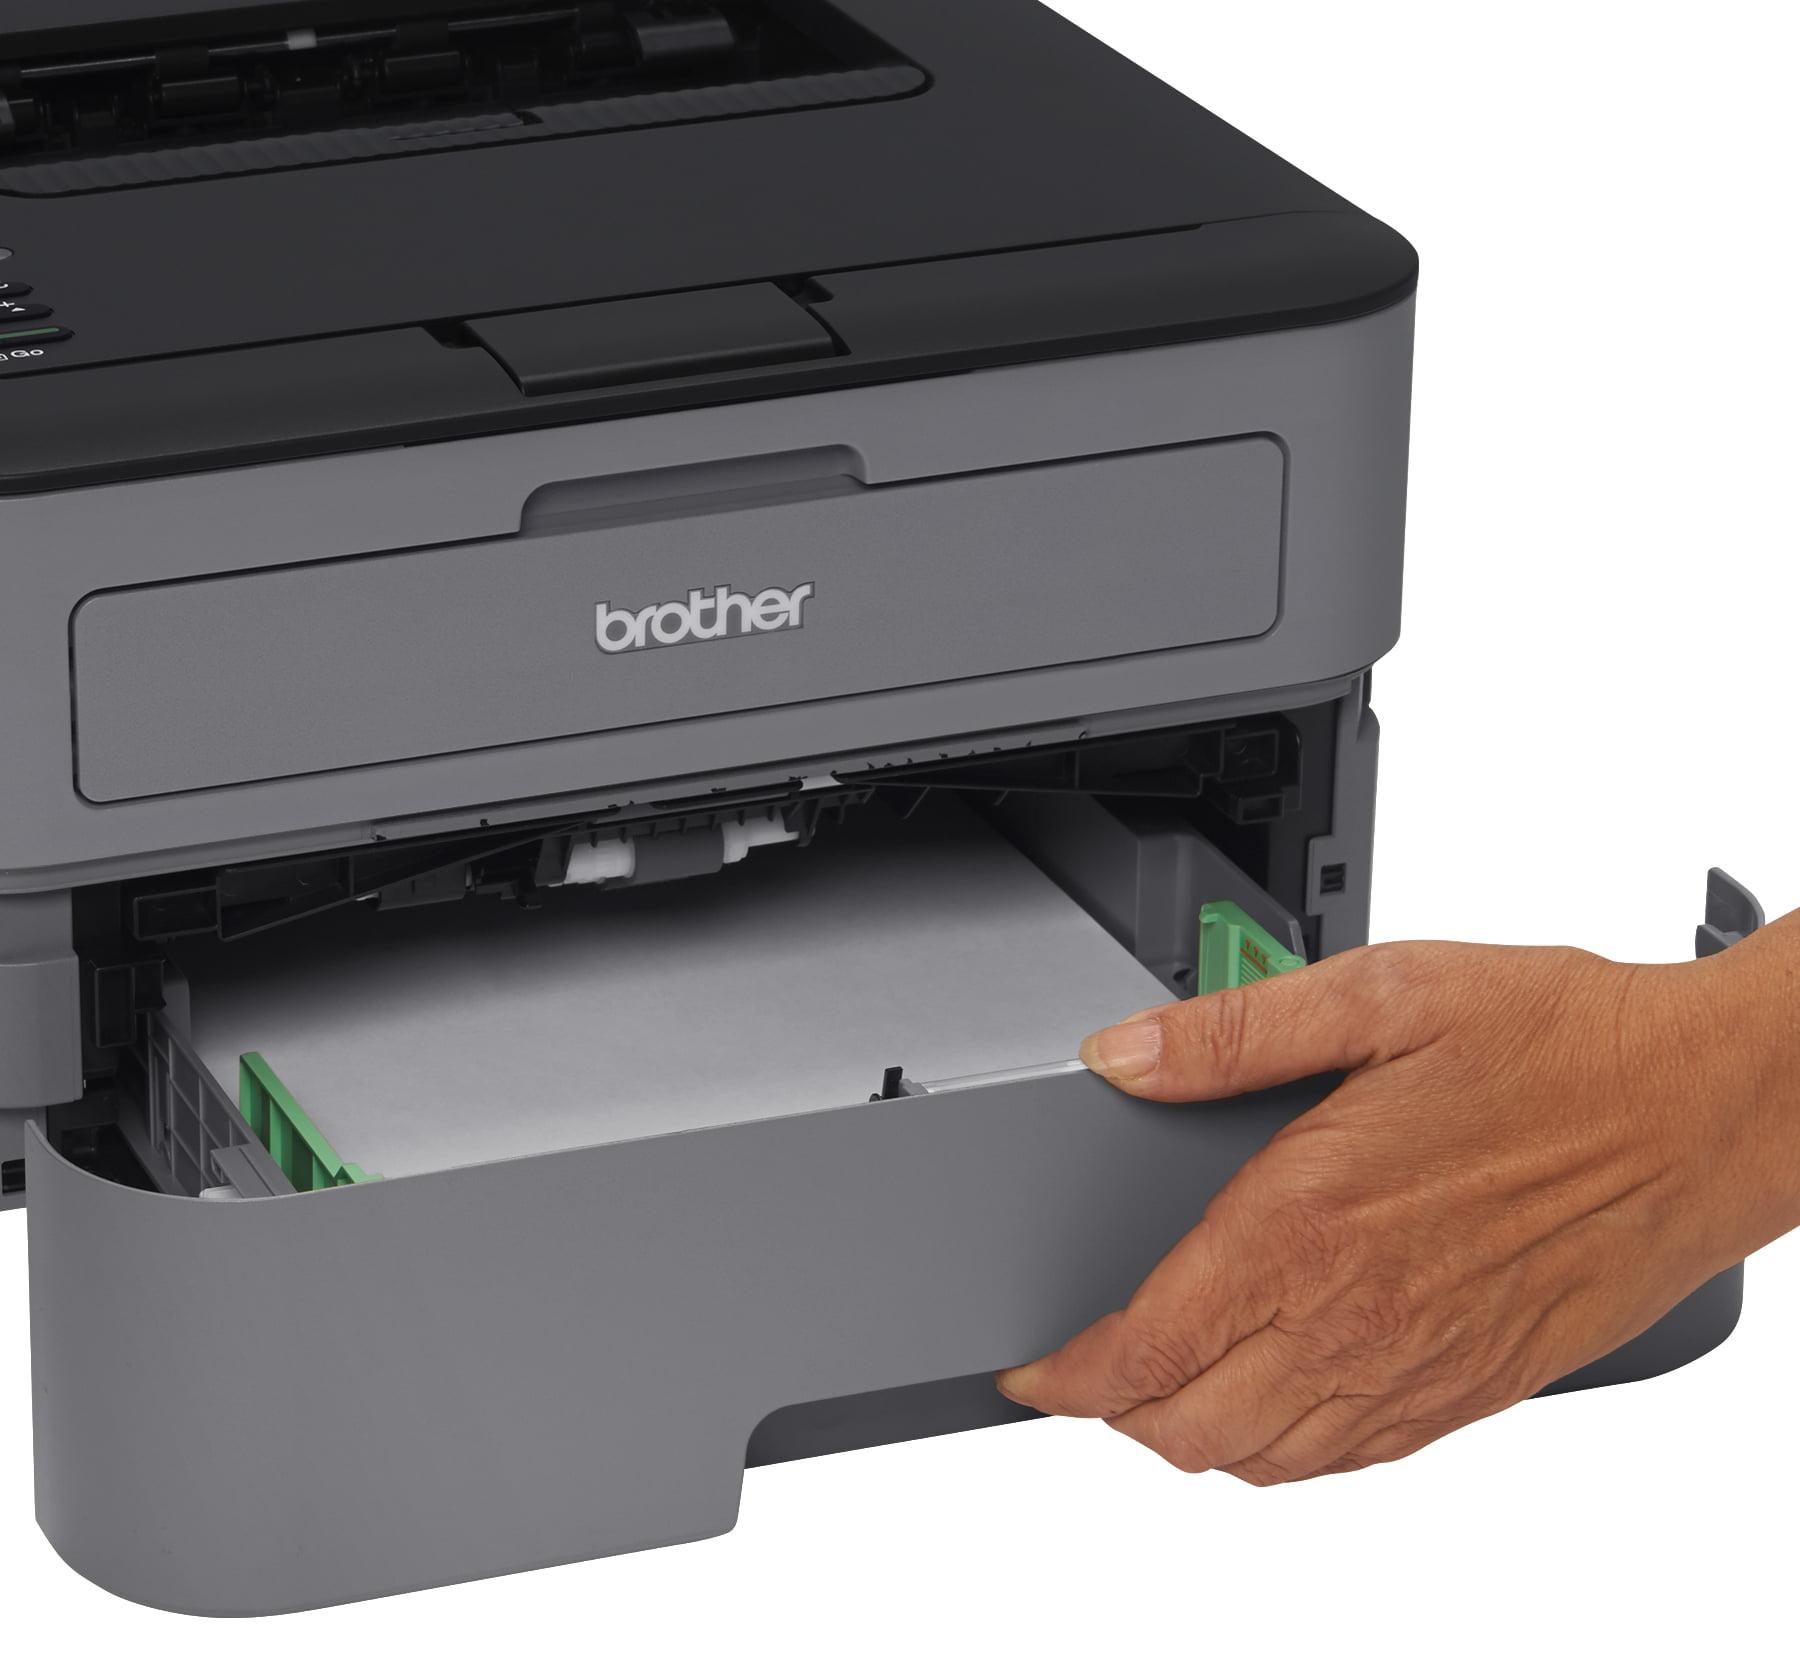 Brother Compact Monochrome Laser Printer, HL-L2315DW, Wireless